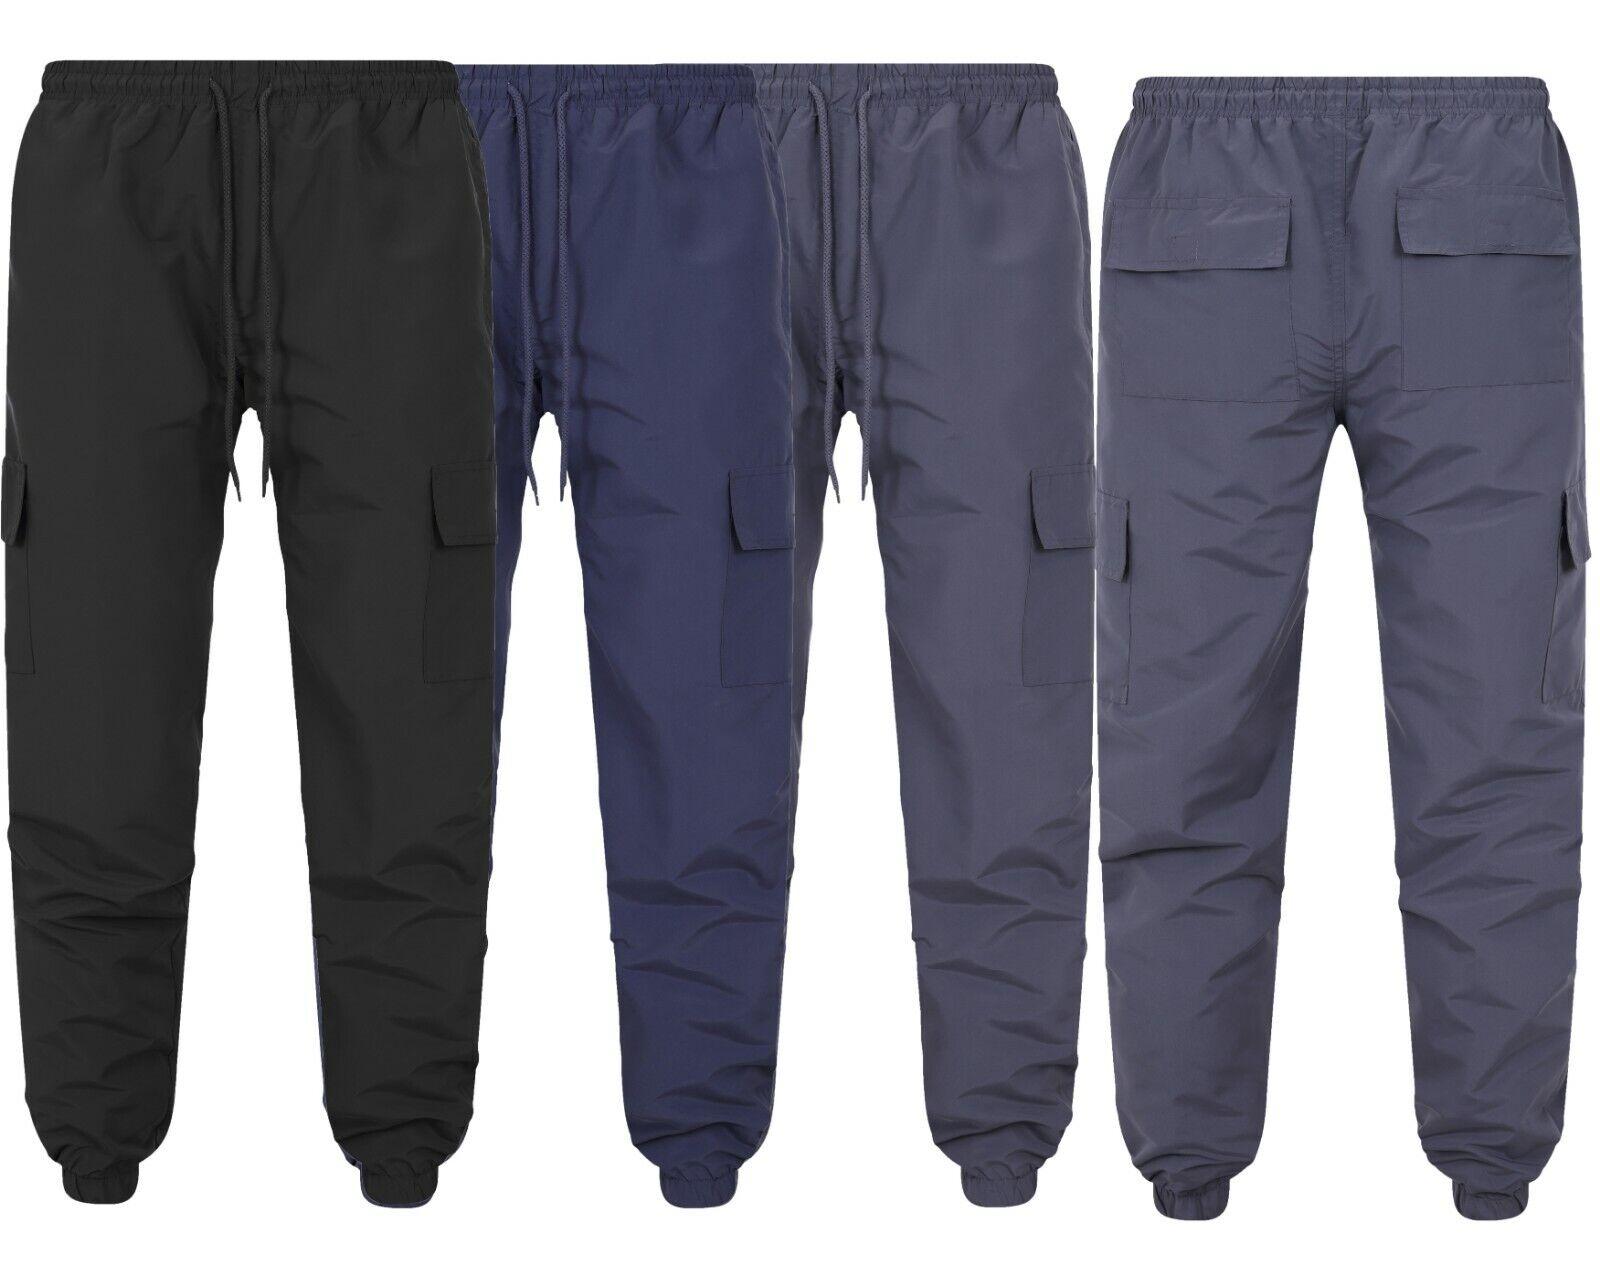 Mens Cargo Trousers Zip Pockets Jogging Bottom Sport Gym Work Wear S-2XL New